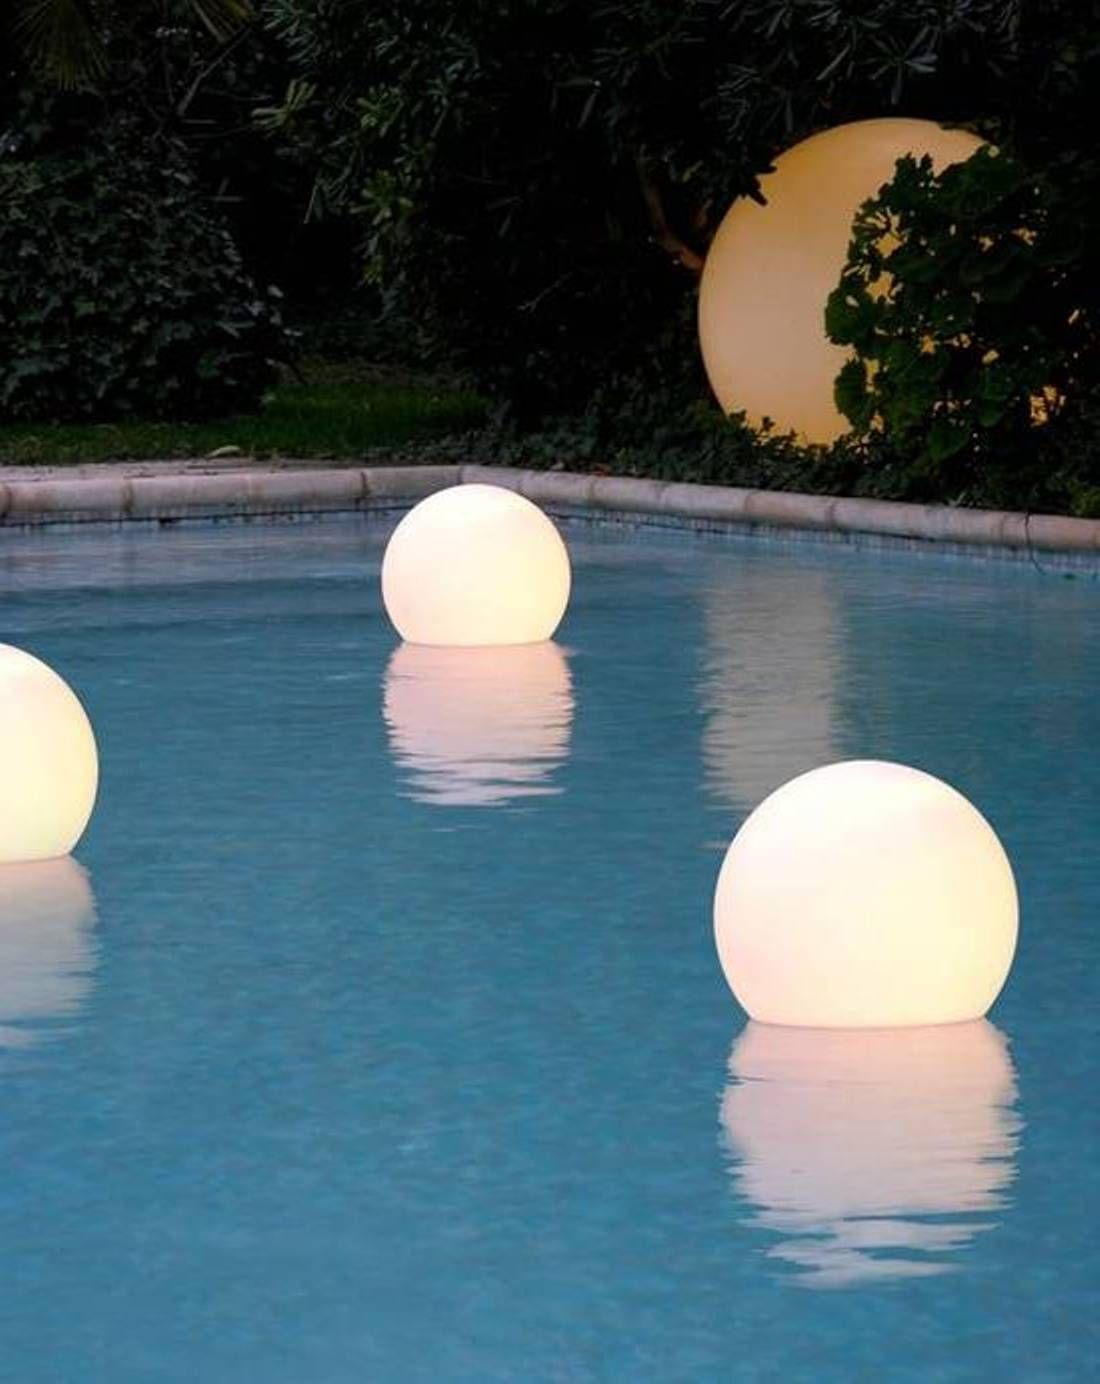 floating pool lights for inground pools pool ideas pinterest floating p. Black Bedroom Furniture Sets. Home Design Ideas